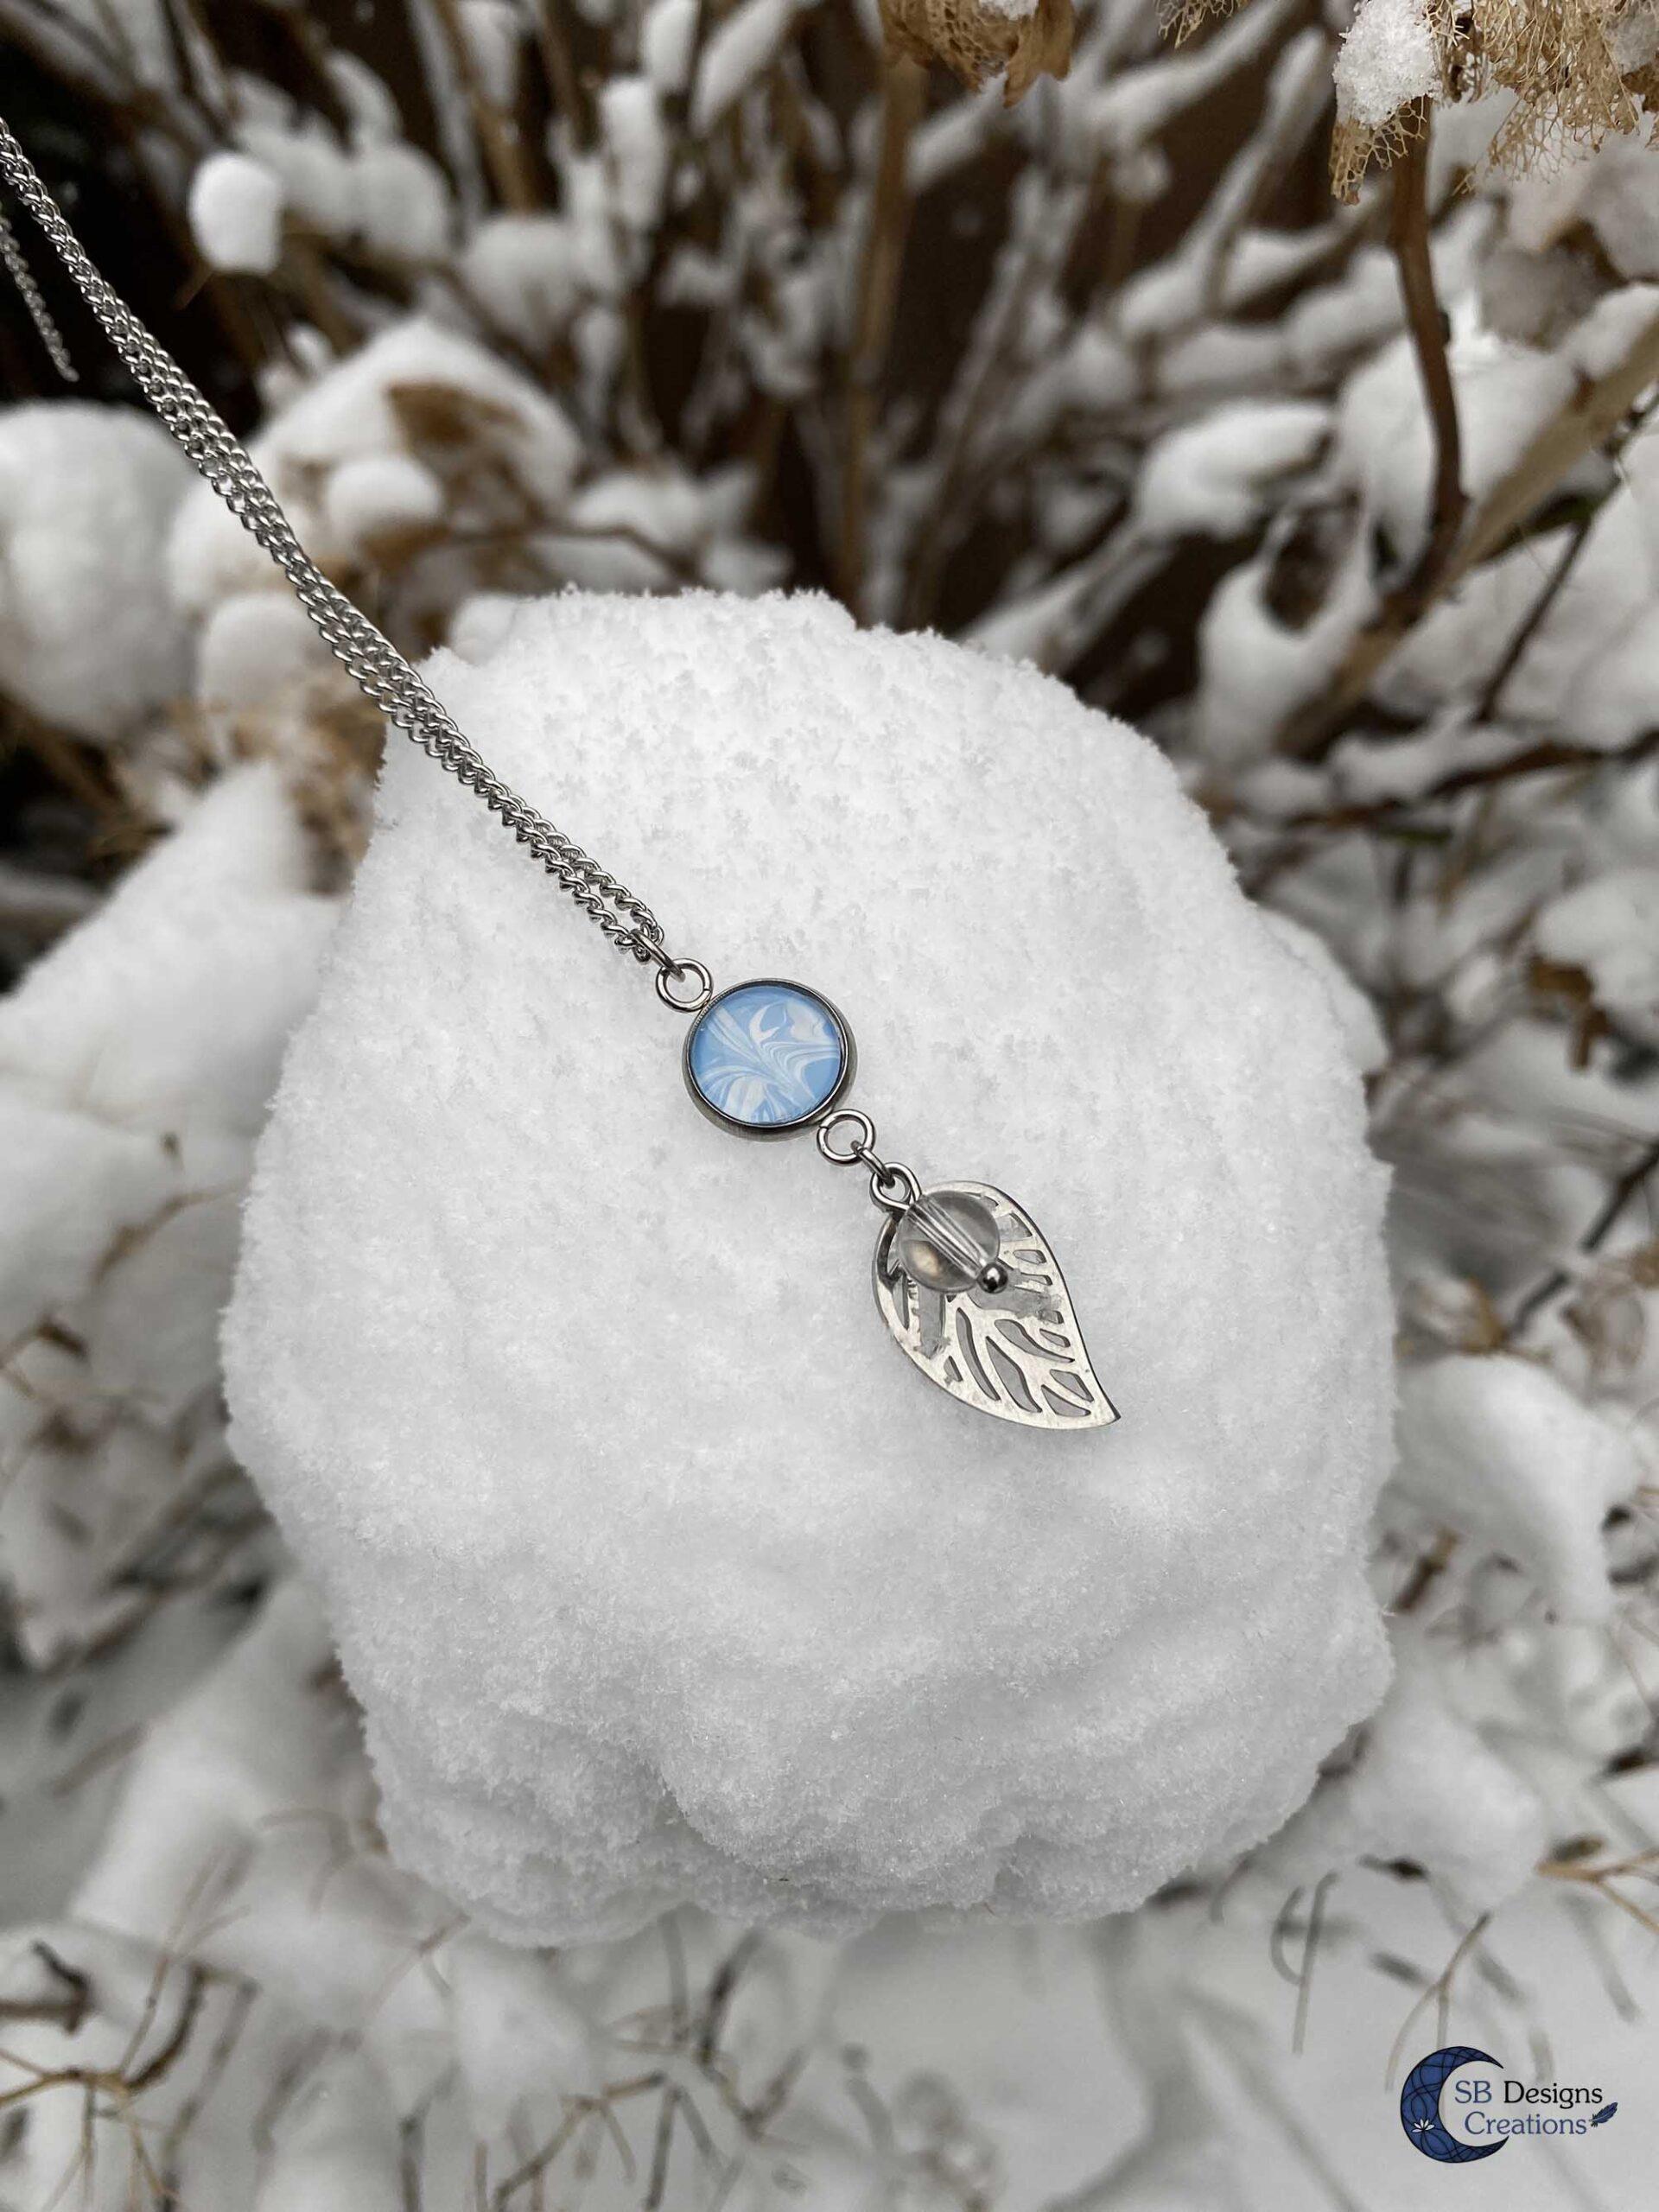 Winter-Leaf-Necklace-Natuur-Heks-Sieraden-scaled